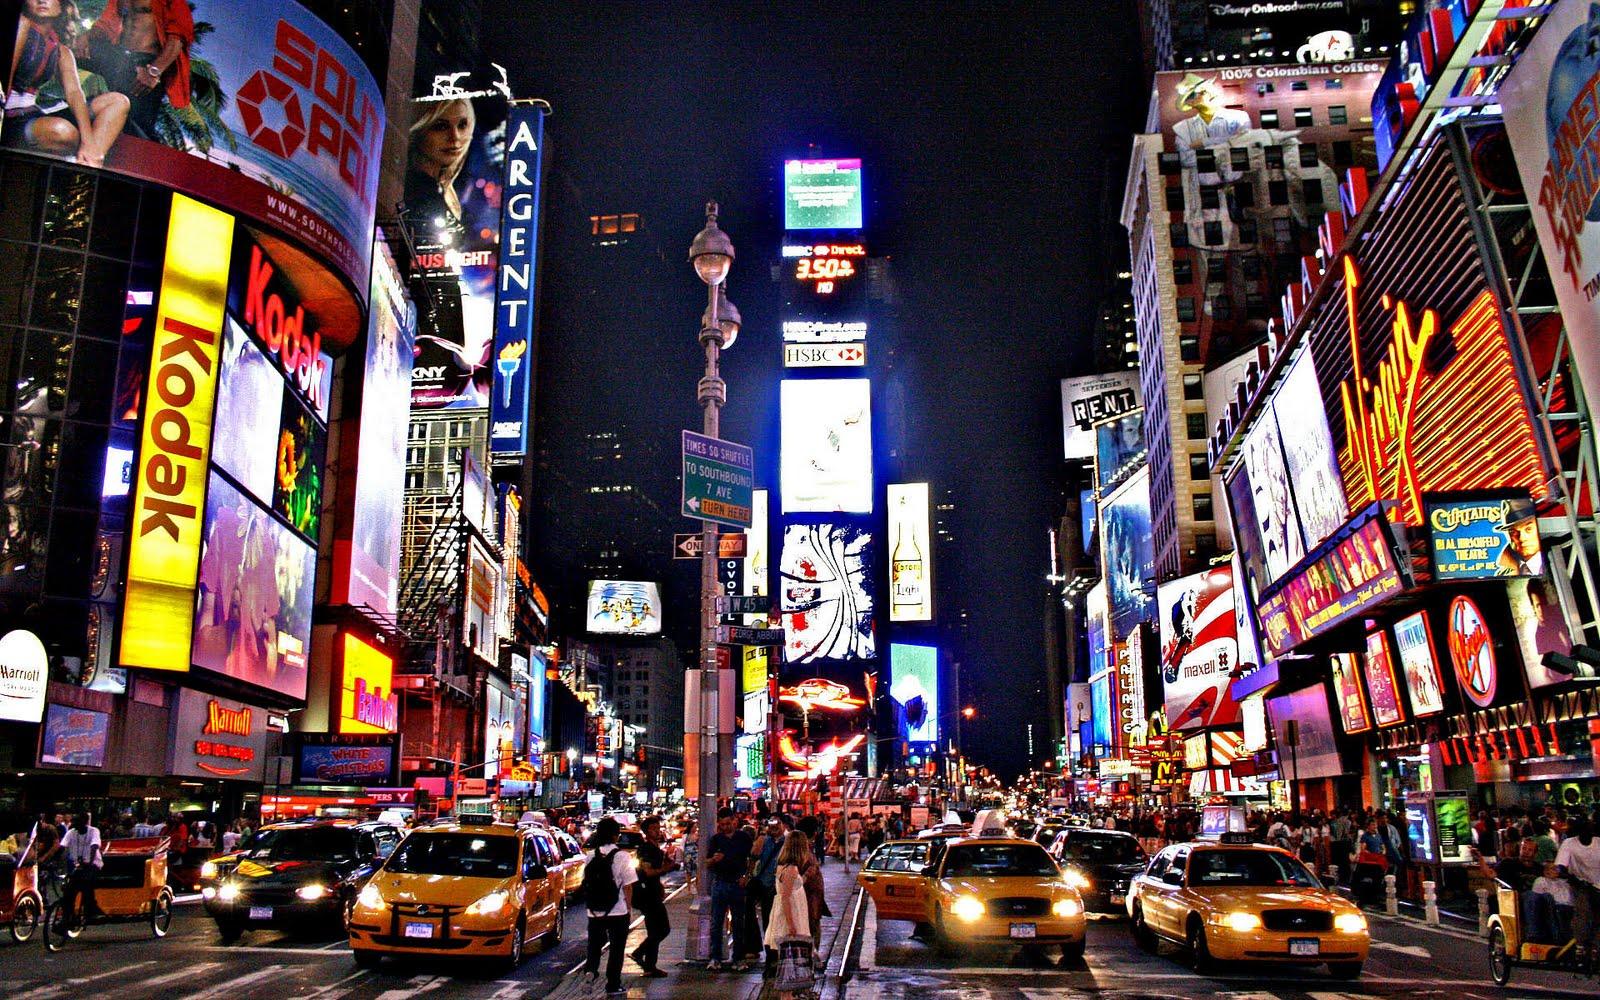 Free Download Download New York City Desktop Wallpaper 1600x1000 For Your Desktop Mobile Tablet Explore 71 Wallpaper Of New York City New York City Images Wallpaper New York City